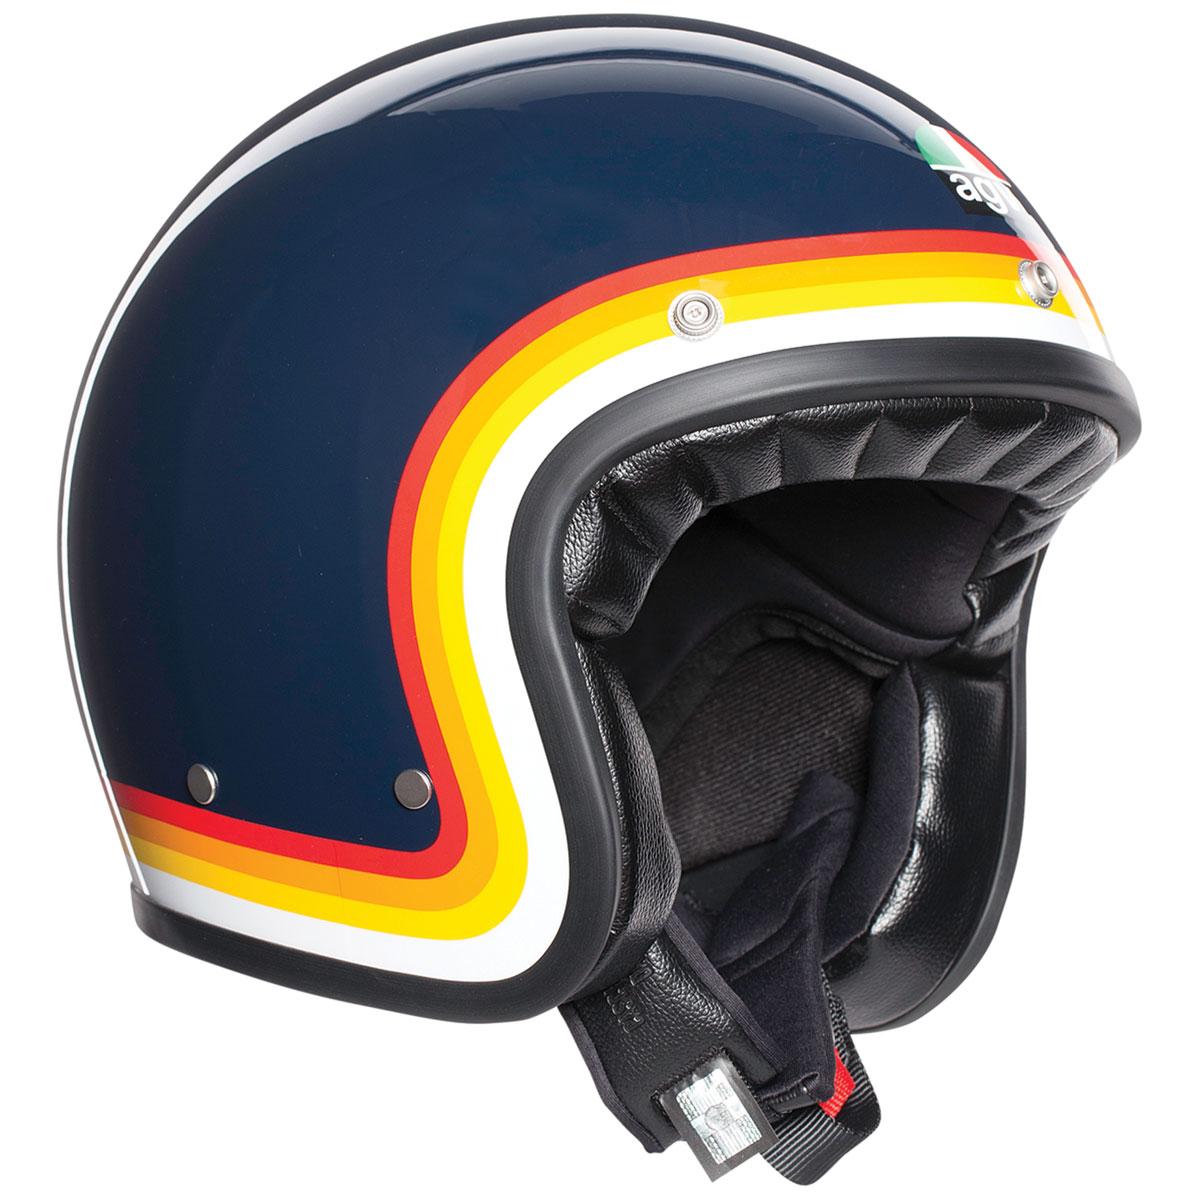 AGV X70 Riviera Open Face Helmet - 21002152I0007XS